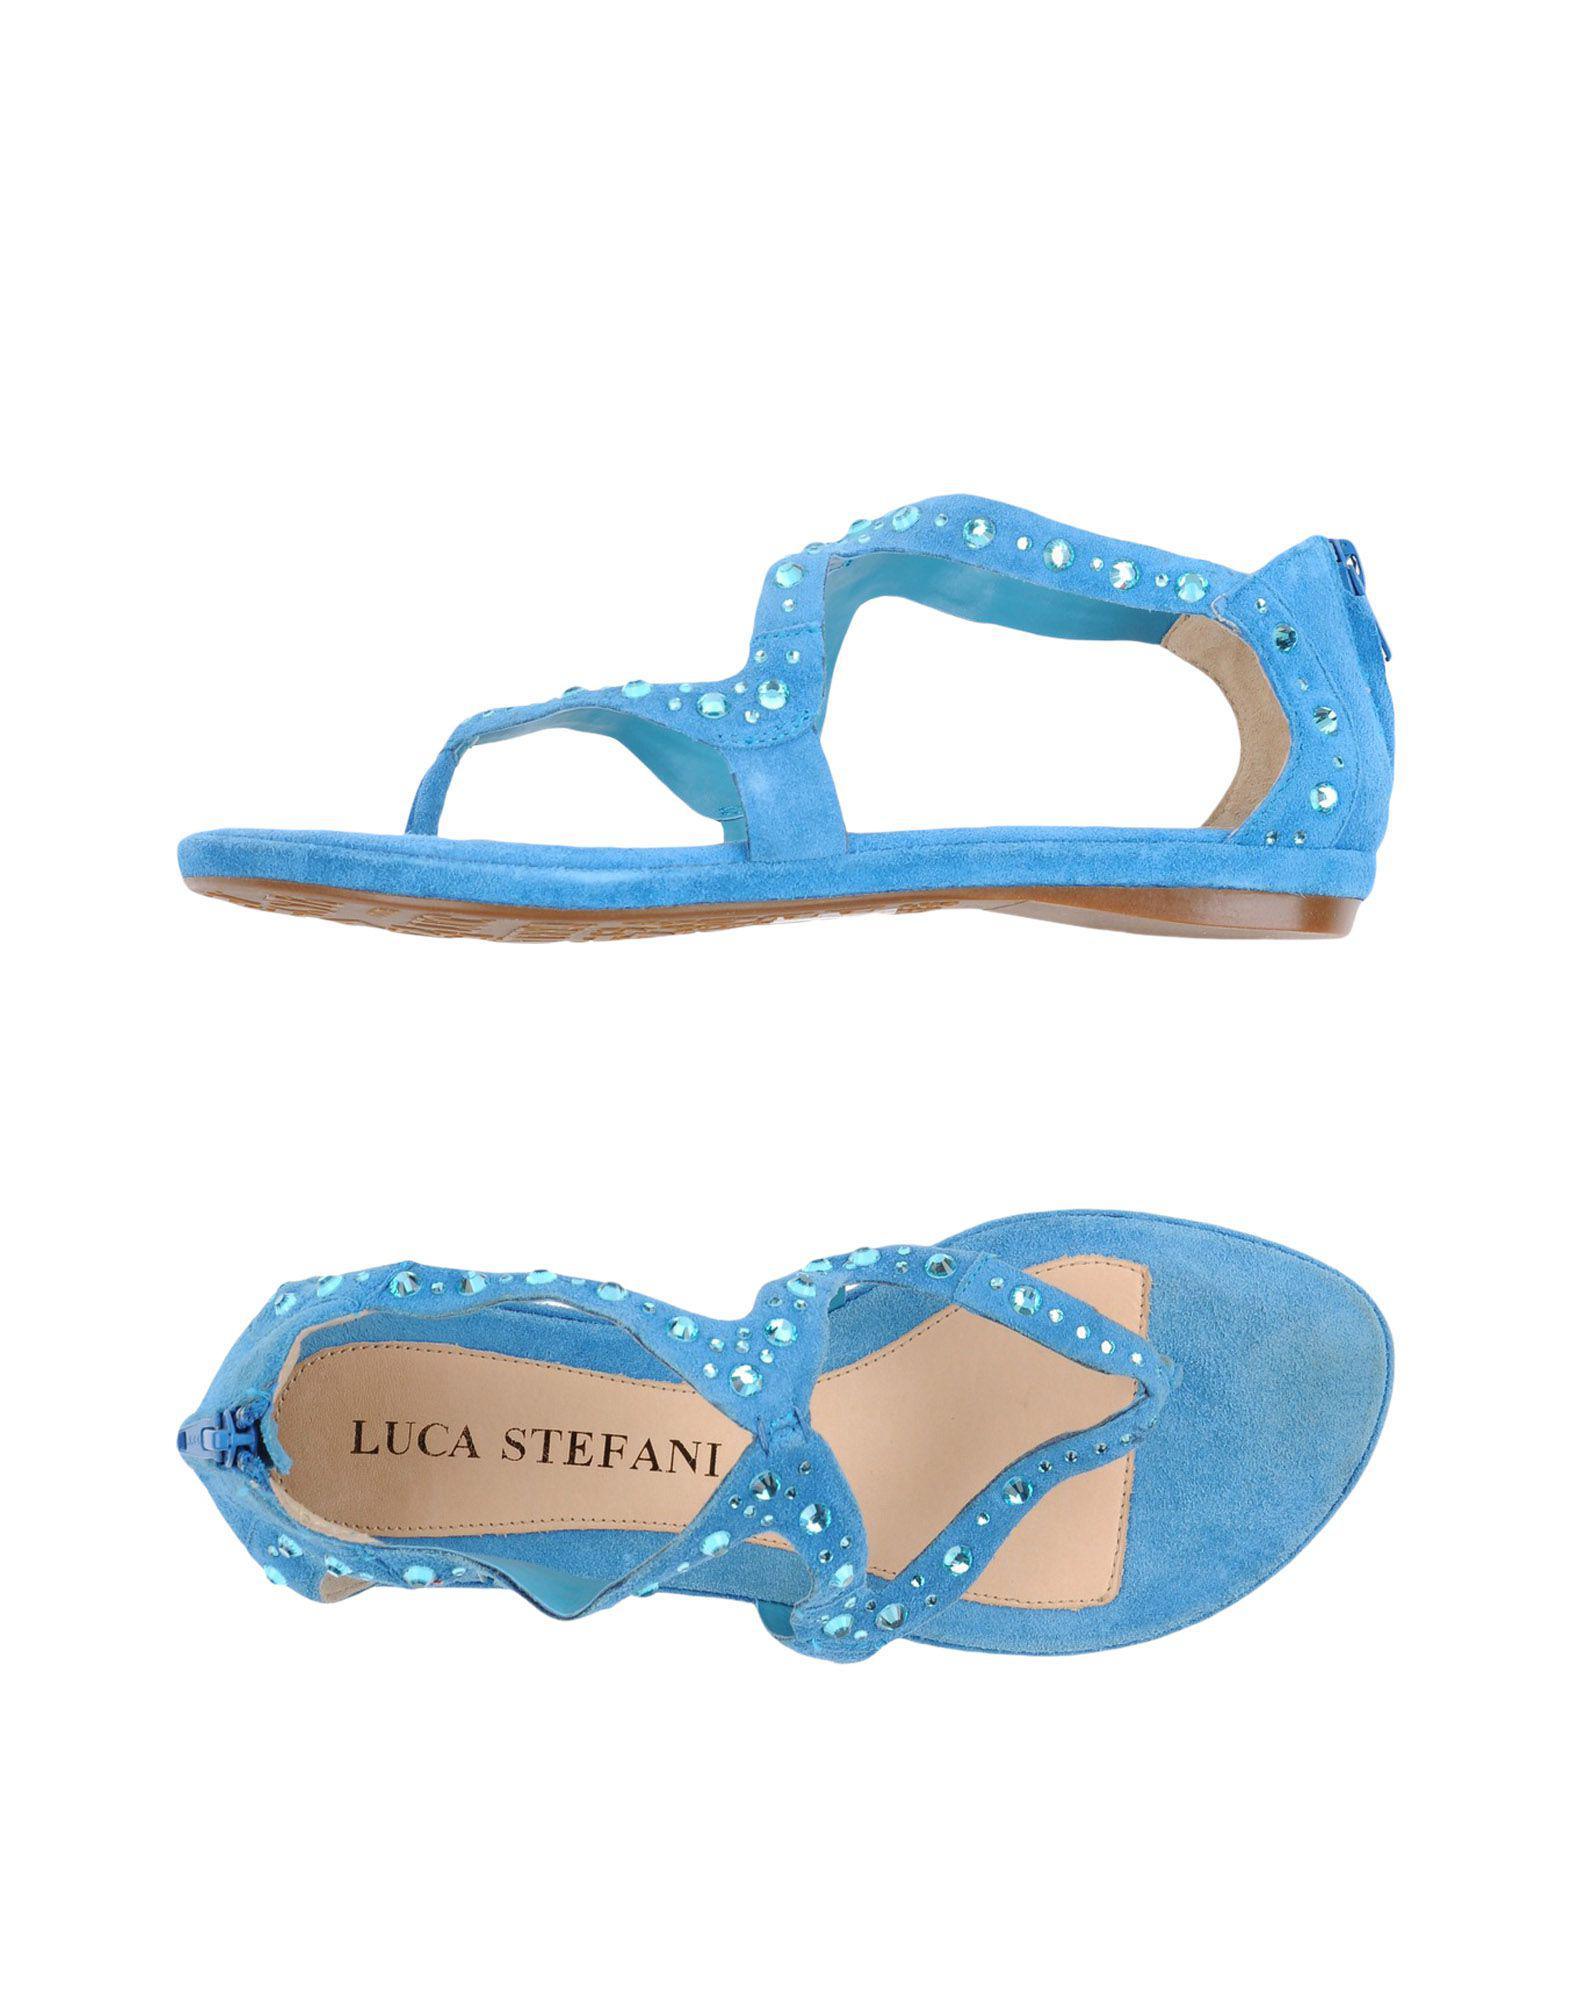 Sandale Entredoigt Stefani Luca wGhqxfF0